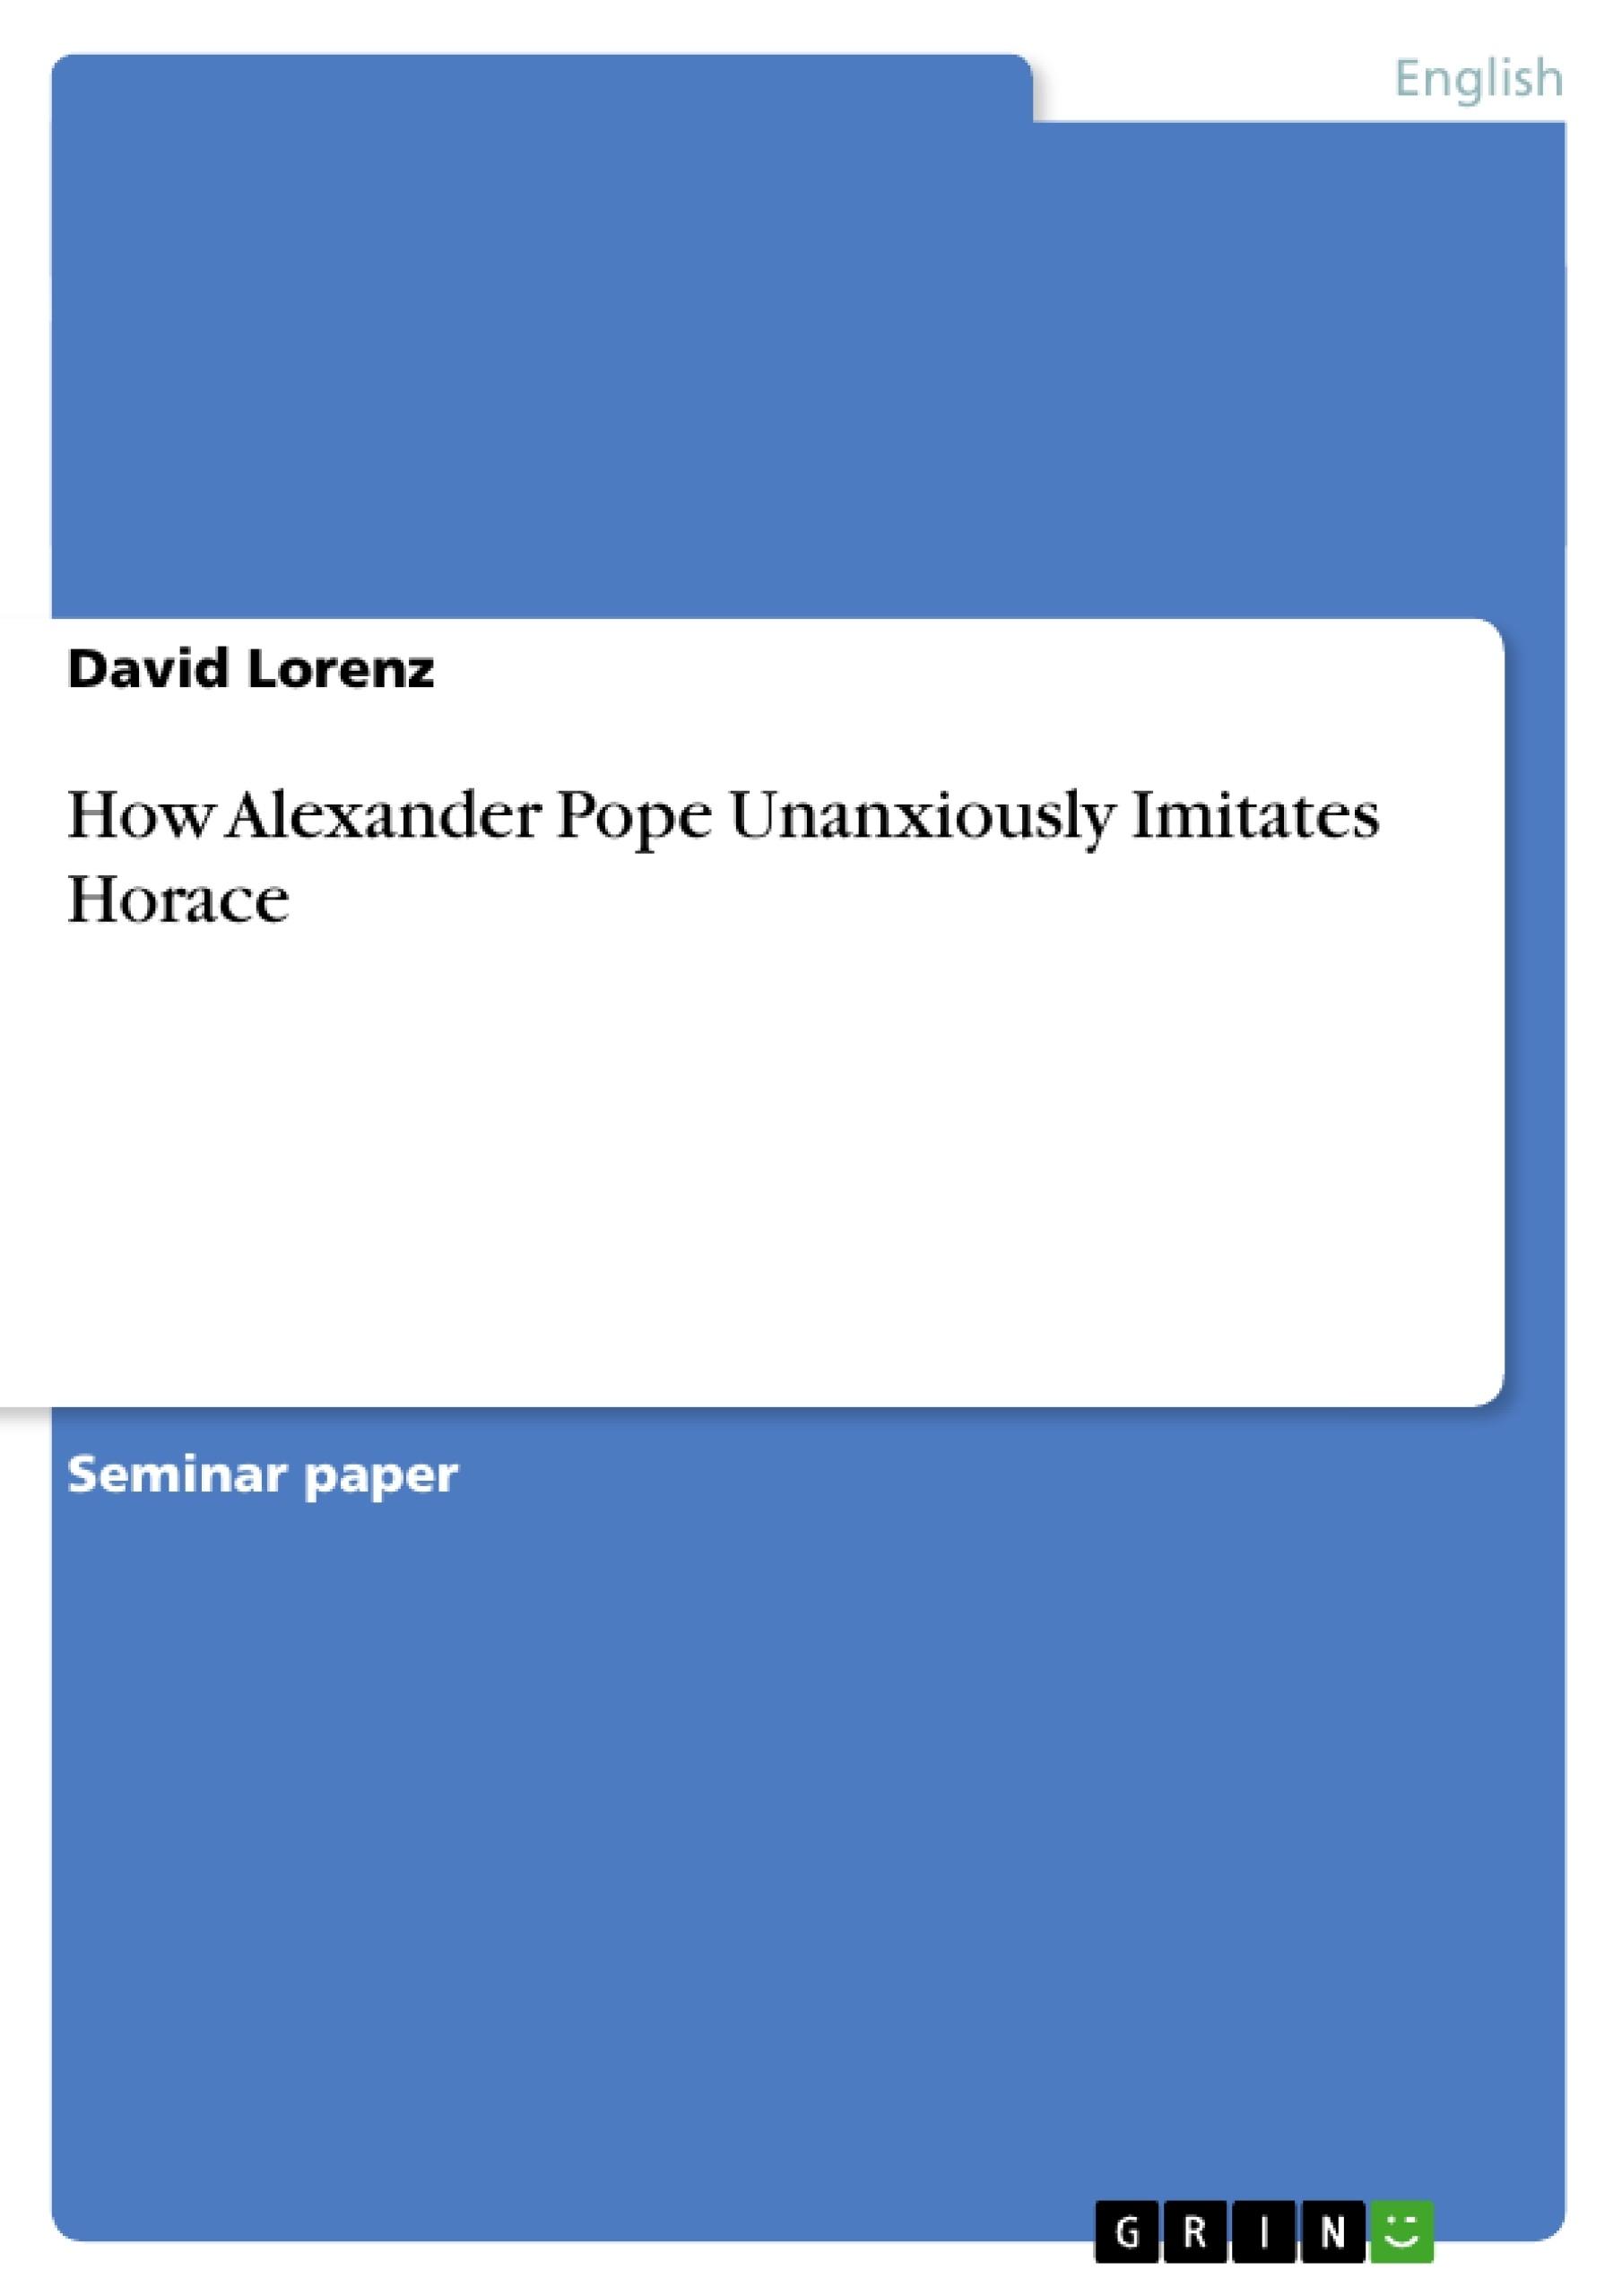 resume of william shakespeare how to resume internet explorer alexander pope essay on man alexander pope s an essay on man summary amp analysis video